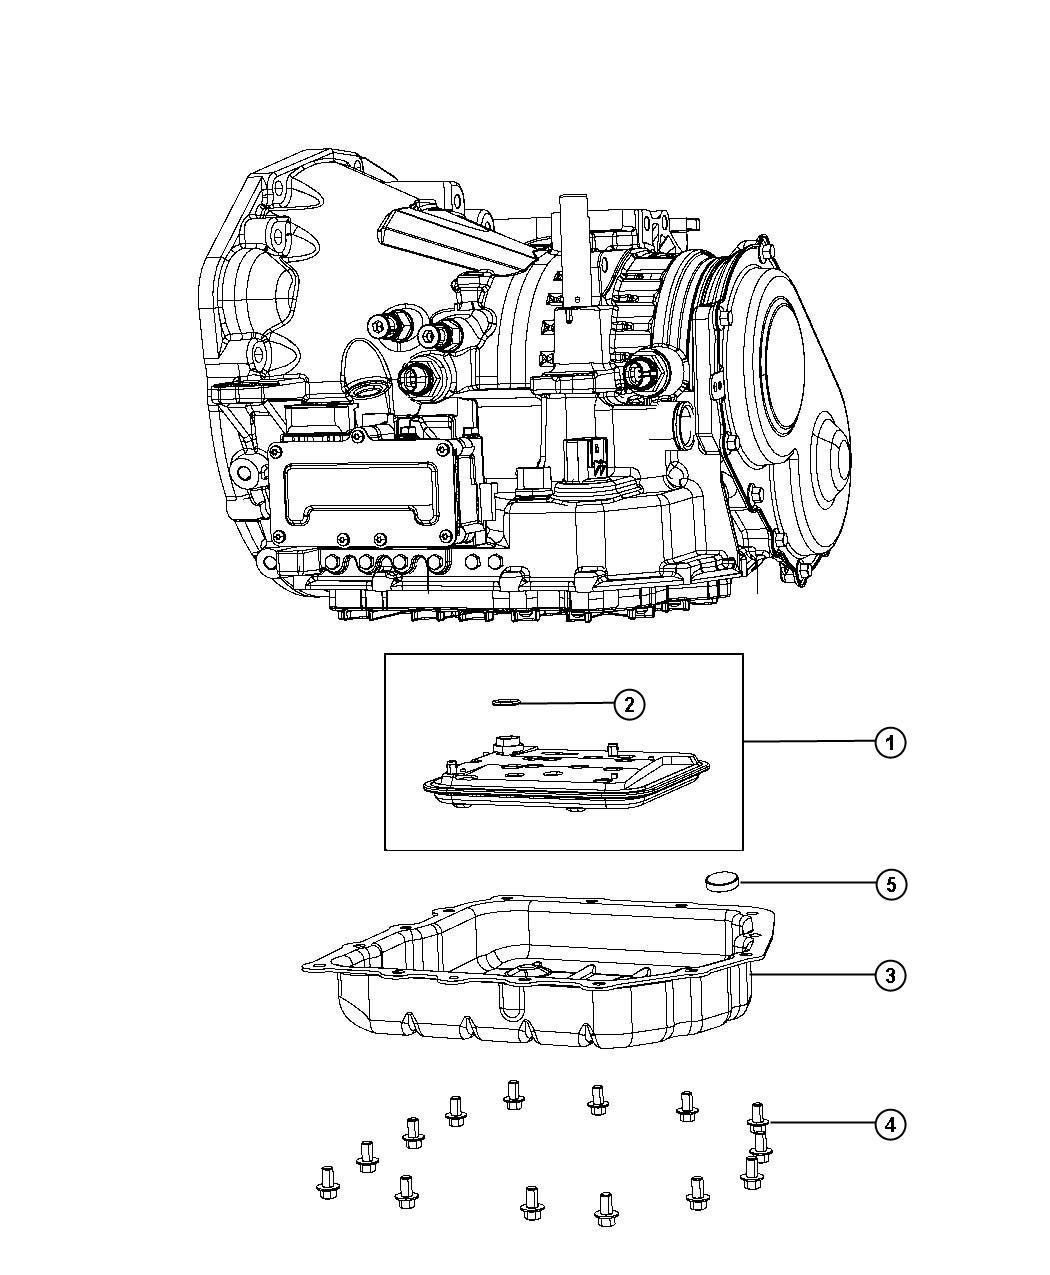 2008 Dodge Avenger SXT 2.4L 4 Cyl A/T Filter kit, filter